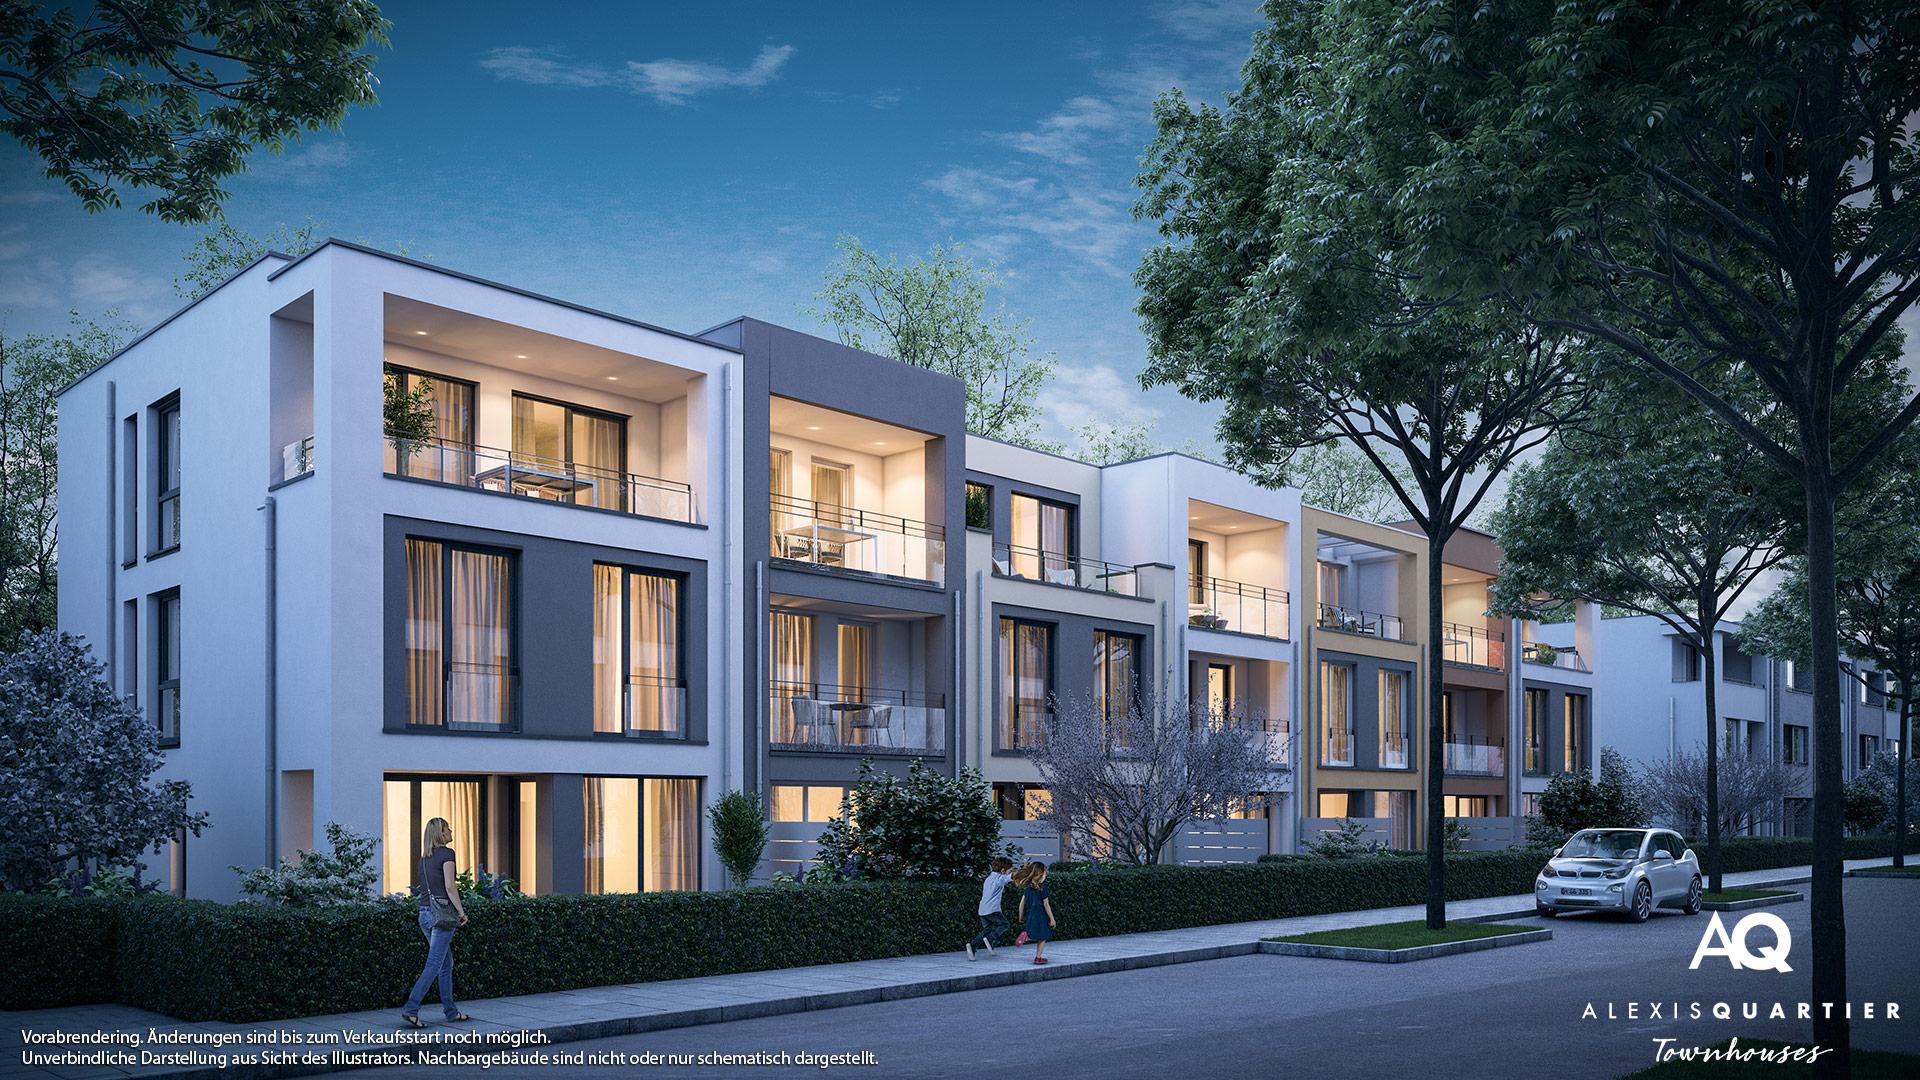 Immobilie Alexisquartier - Townhouses - Vorankündigung - Illustration 2